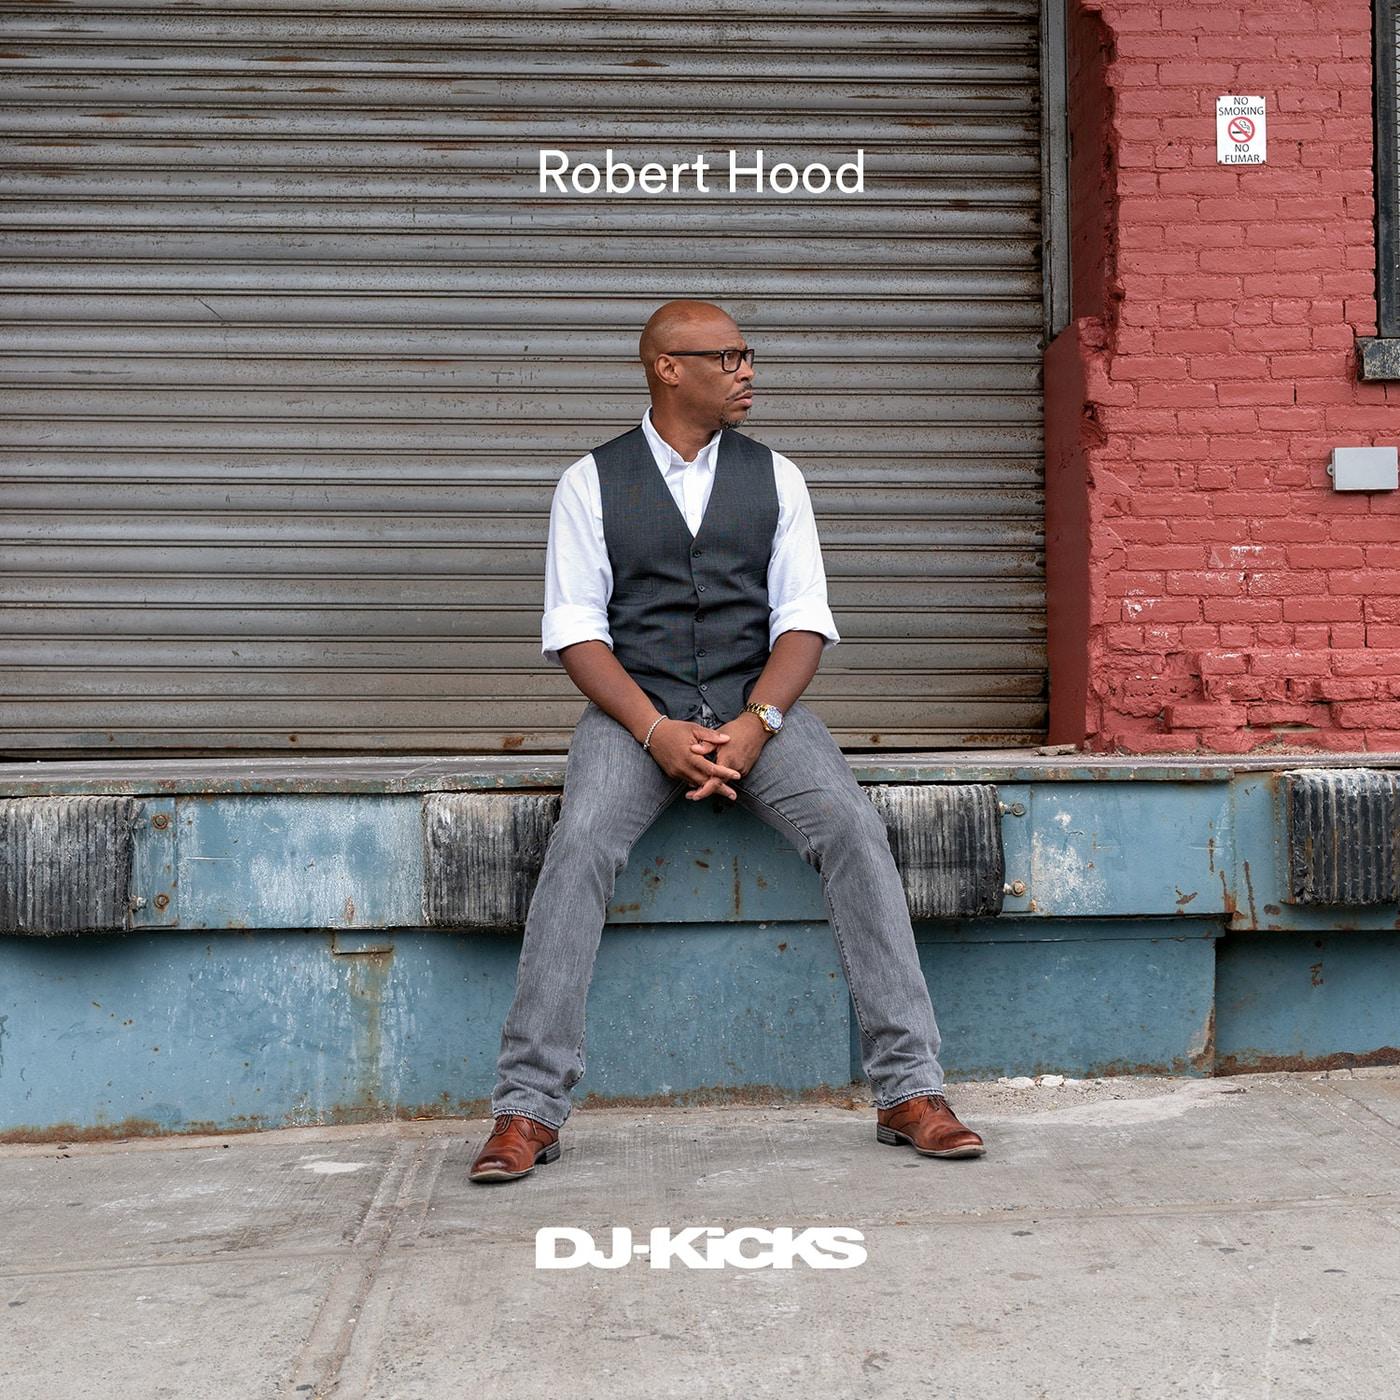 DJ-Kicks enlists techno legend Robert Hood for latest compilation